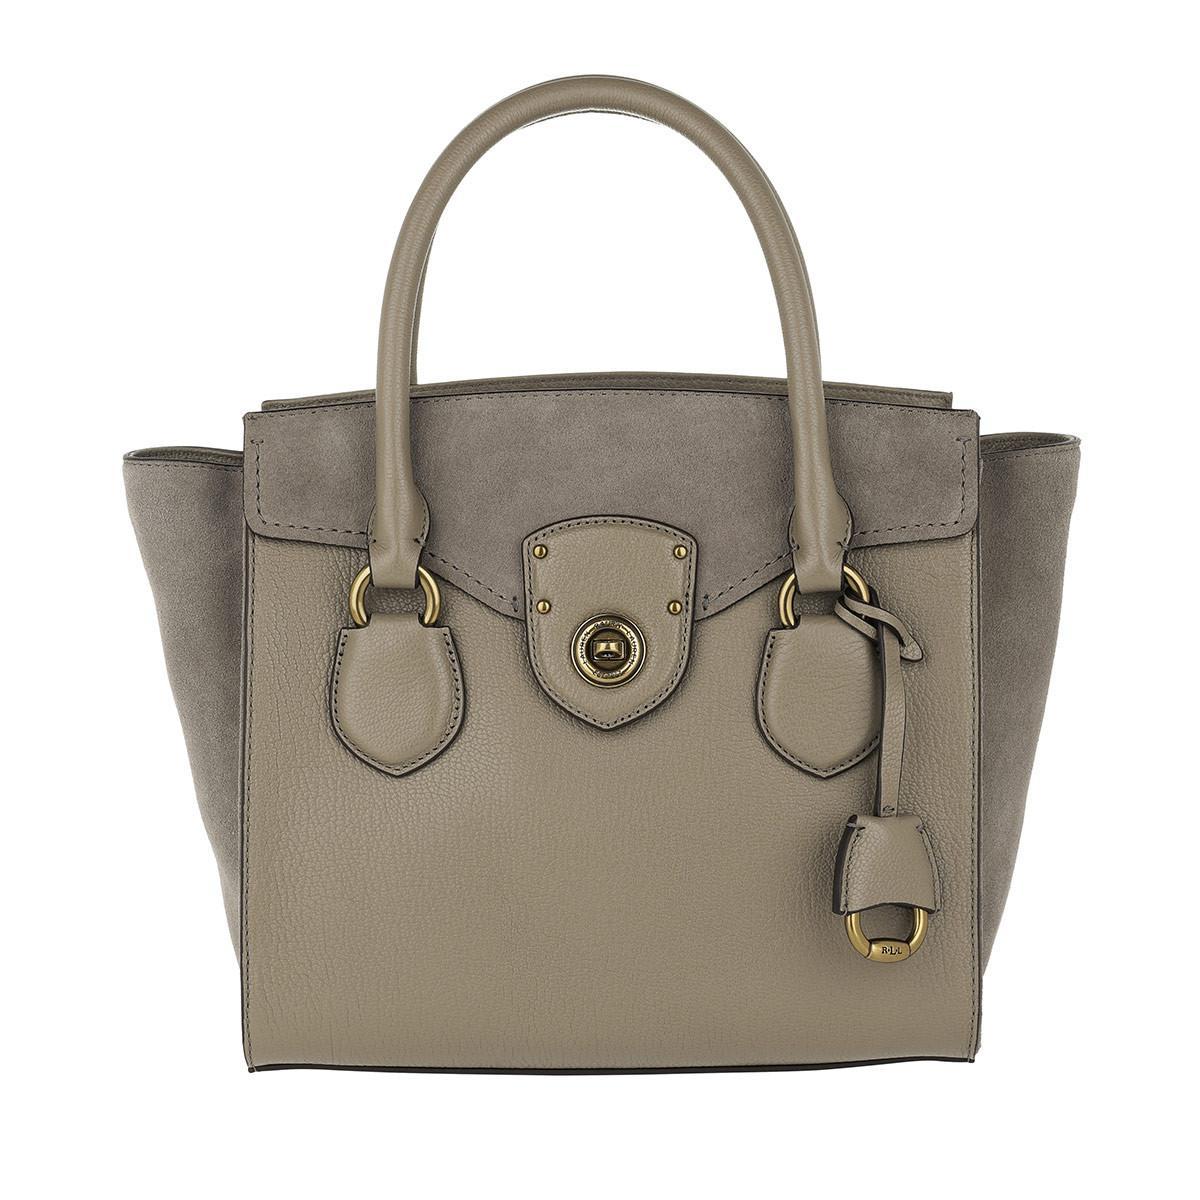 Lauren by Ralph Lauren. Women s Millbrook Satchel Bag Medium Taupe 9e0d234c73